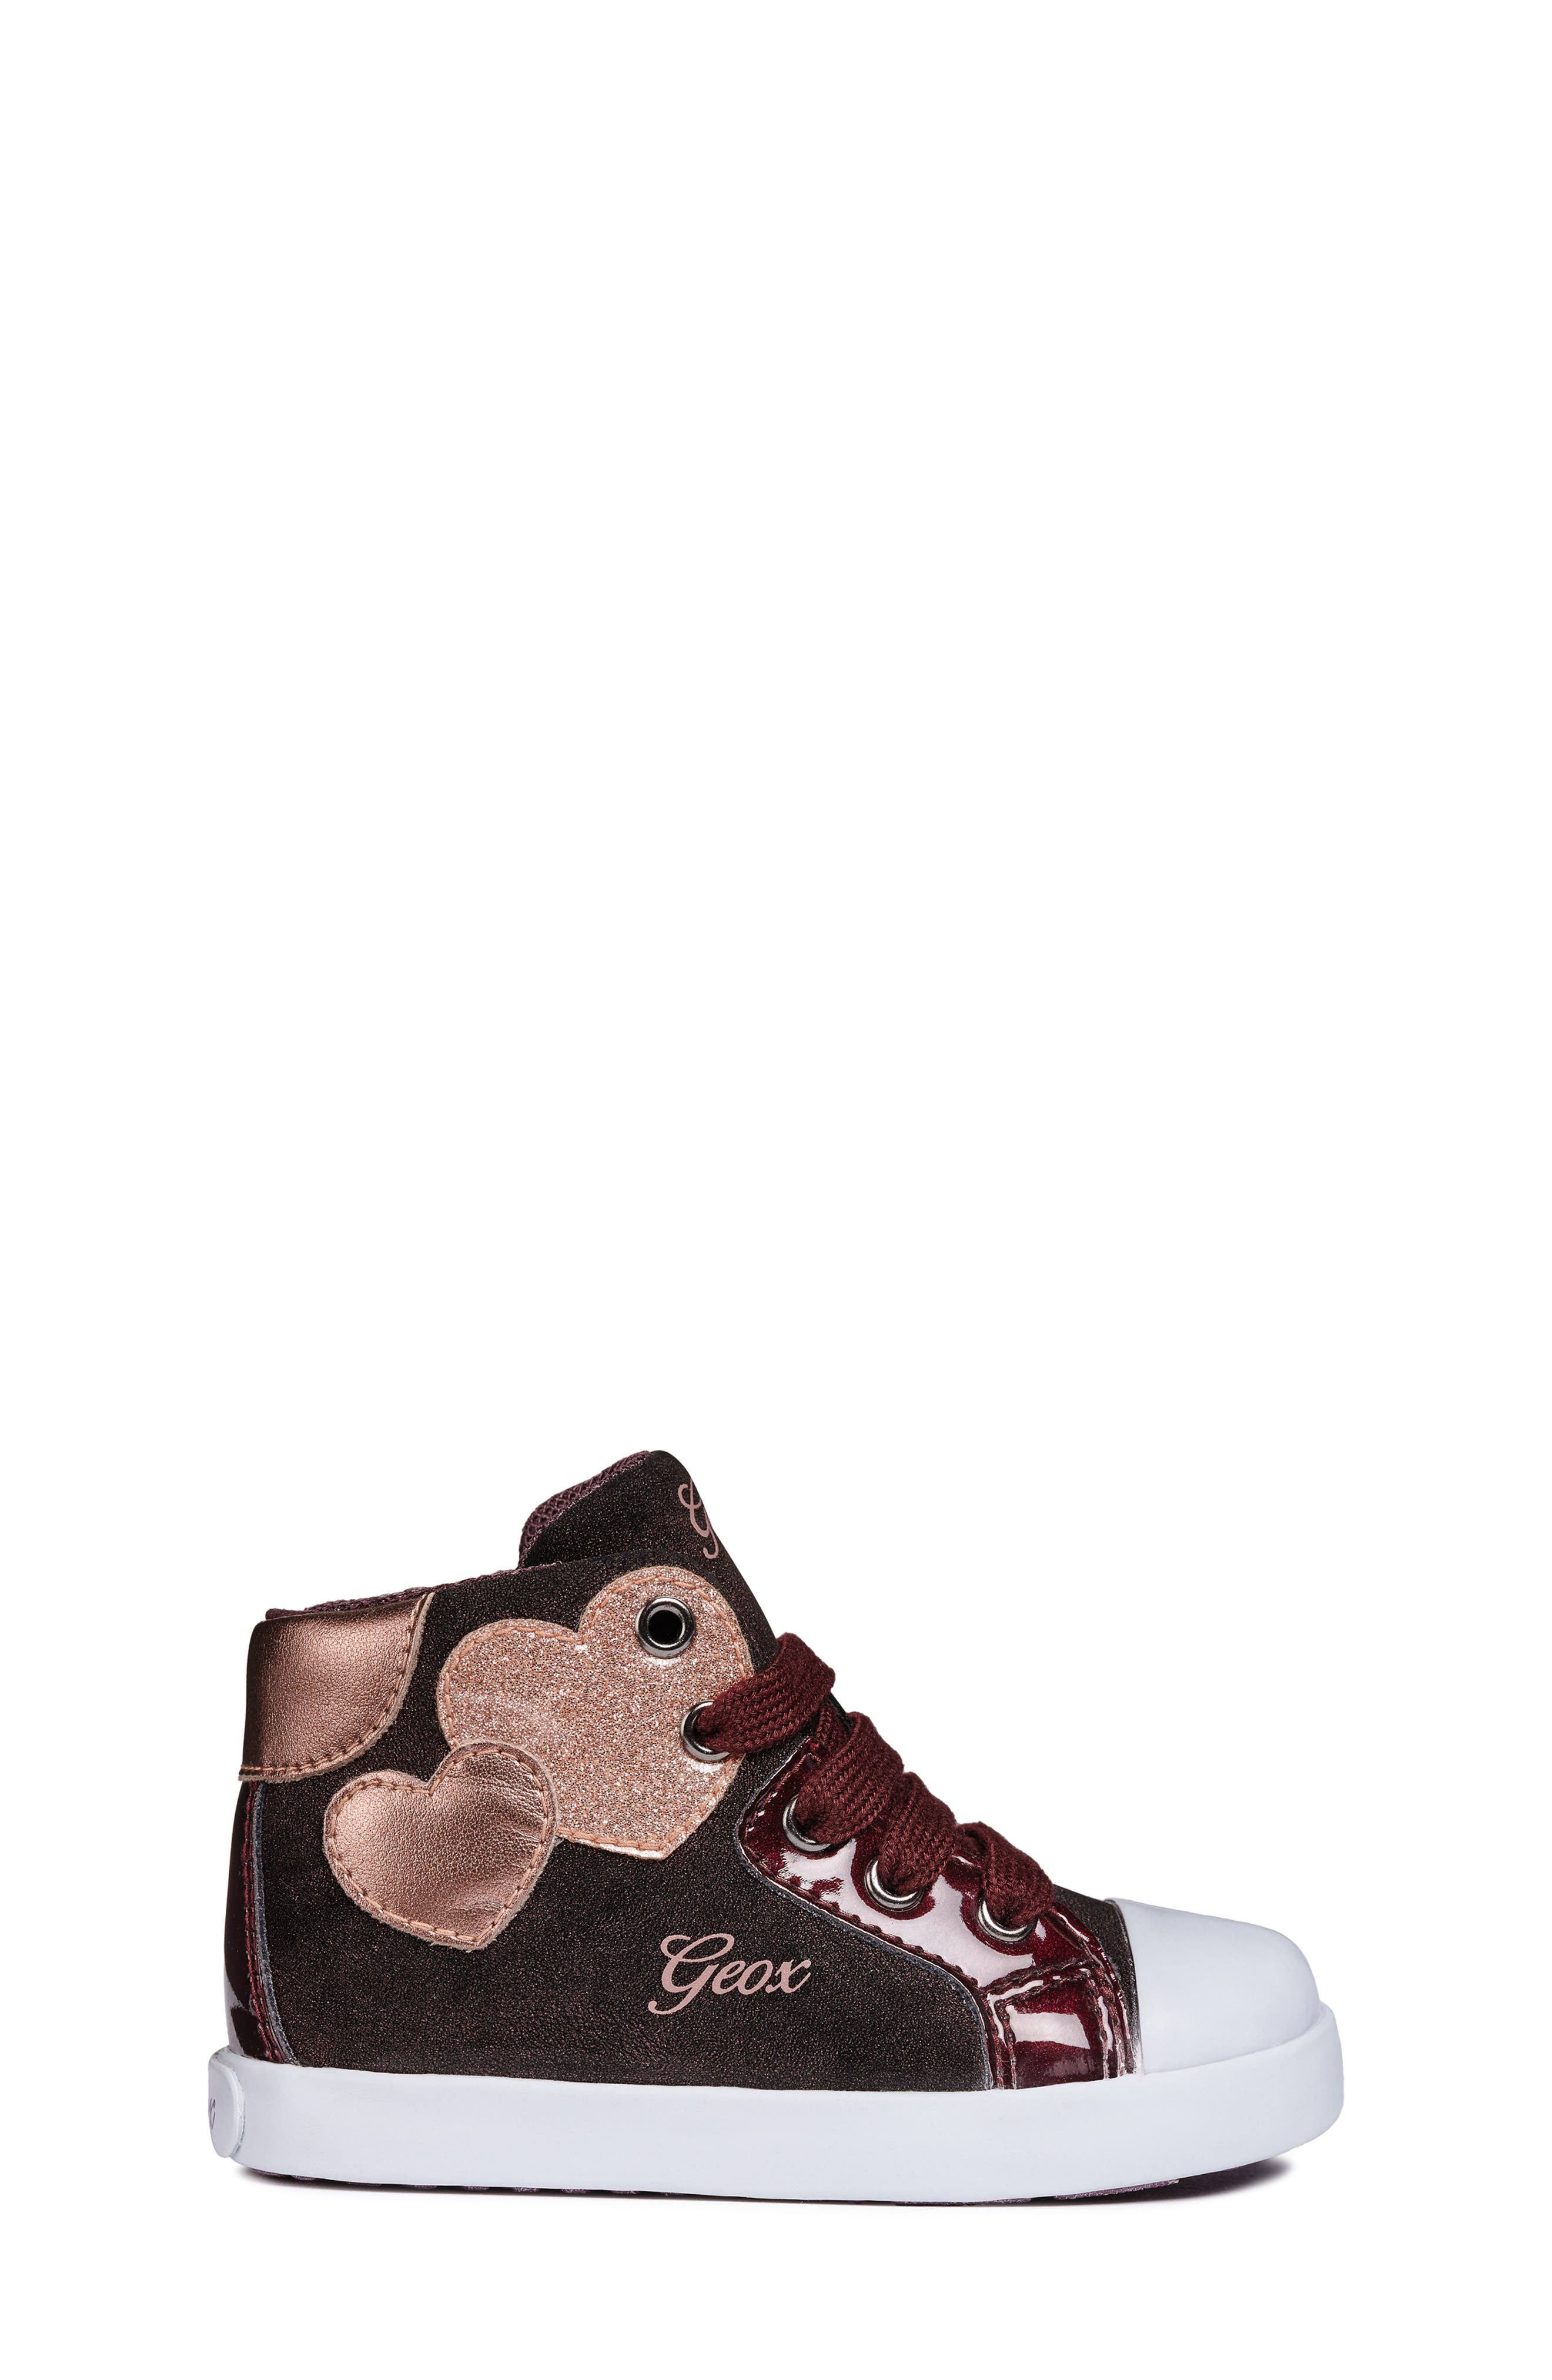 Kilwi Sparkle High Top Sneaker,                             Alternate thumbnail 3, color,                             DARK BURGUNDY